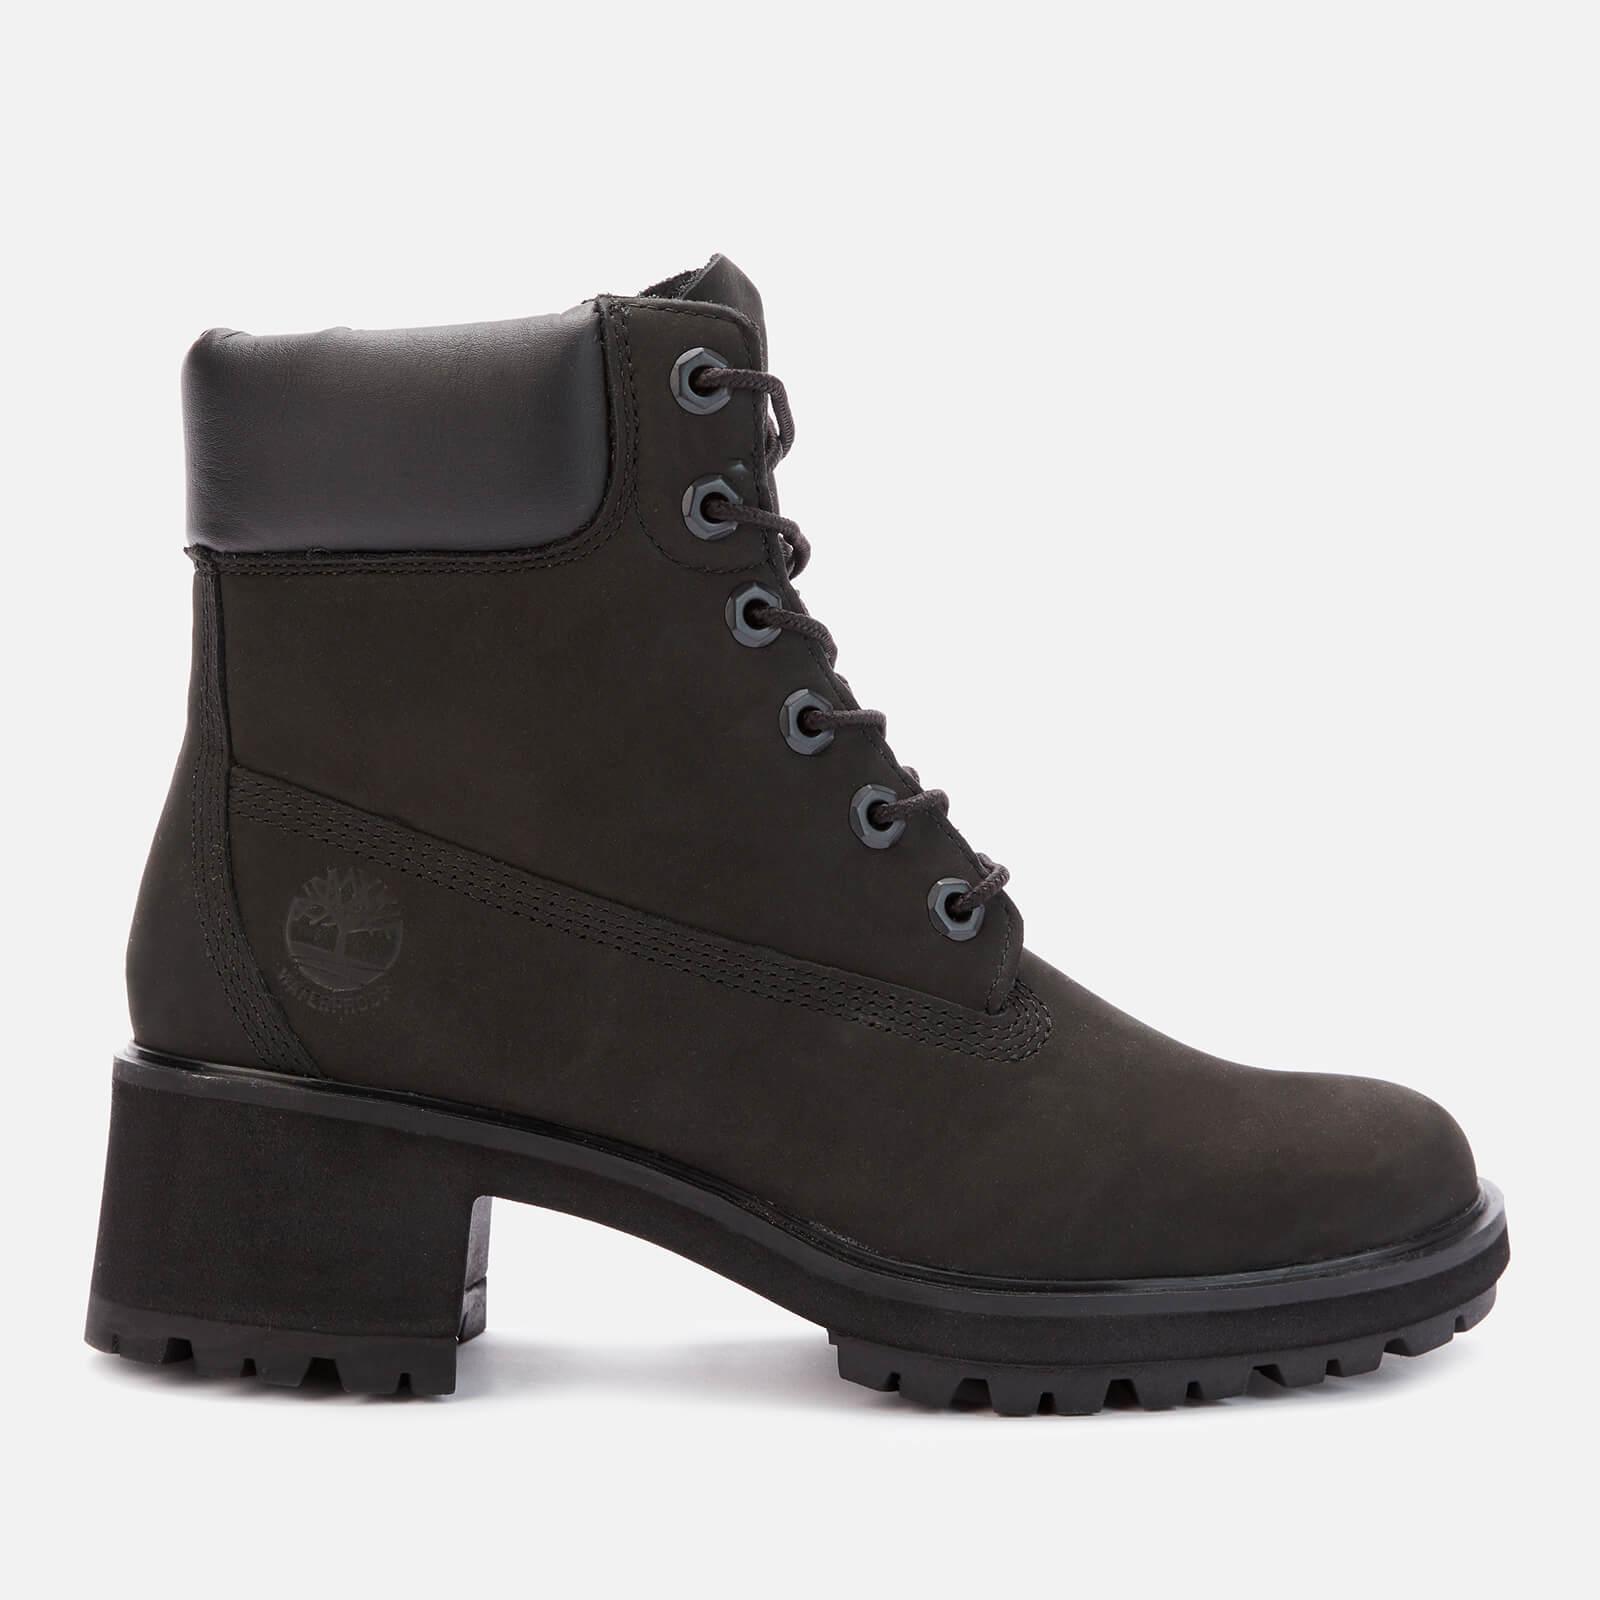 Timberland Women's Kinsley 6 Inch Waterproof Heeled Boots - Black - Uk 3.5